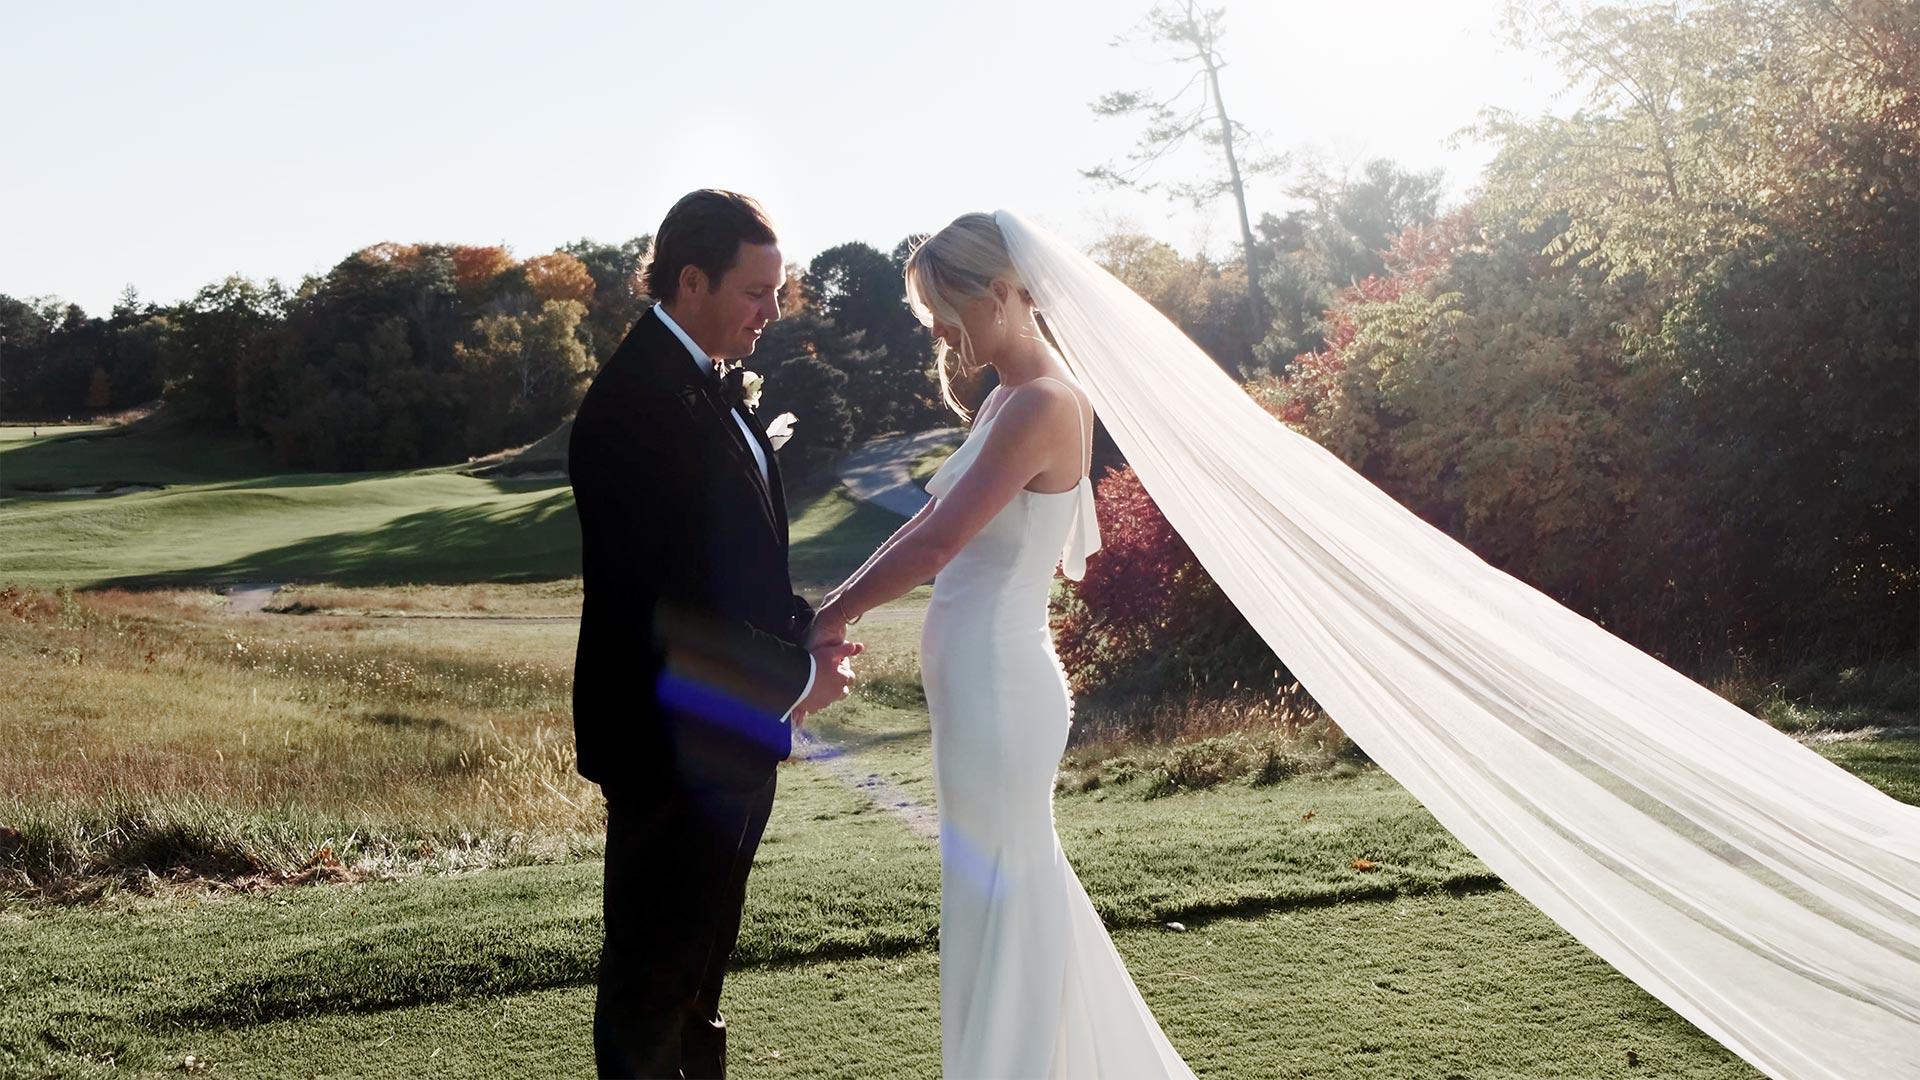 Bride and groom at their Toronto Golf Club micro wedding